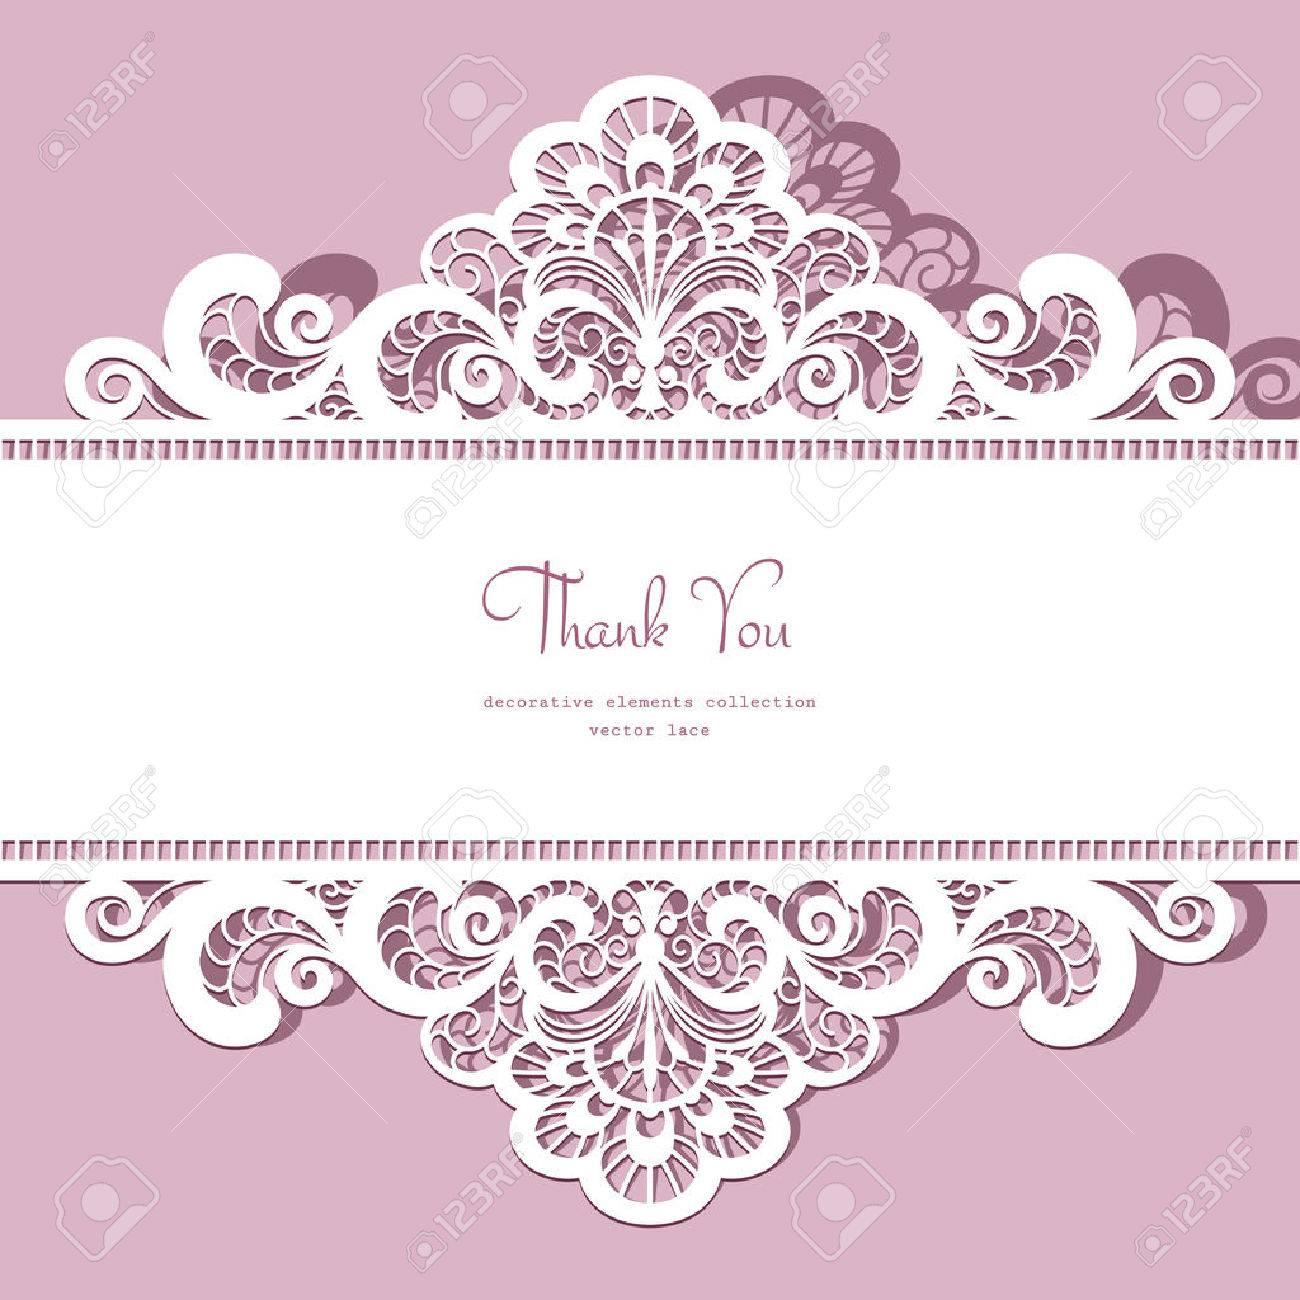 Elegant ornate lace frame, greeting card or invitation template - 43136280